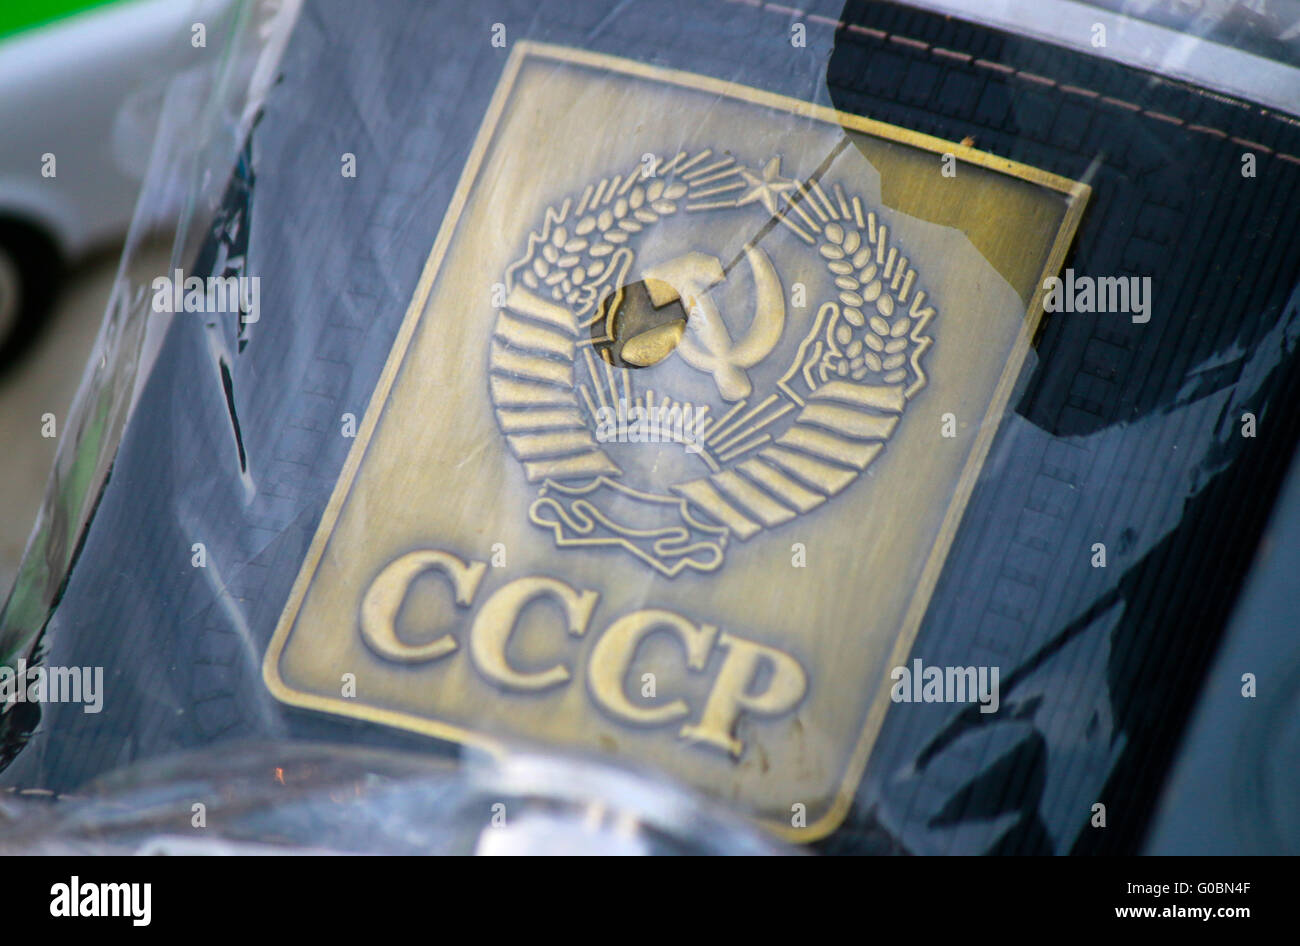 CCCP - Sowjetunion/ Soviet Union, Berlin. - Stock Image